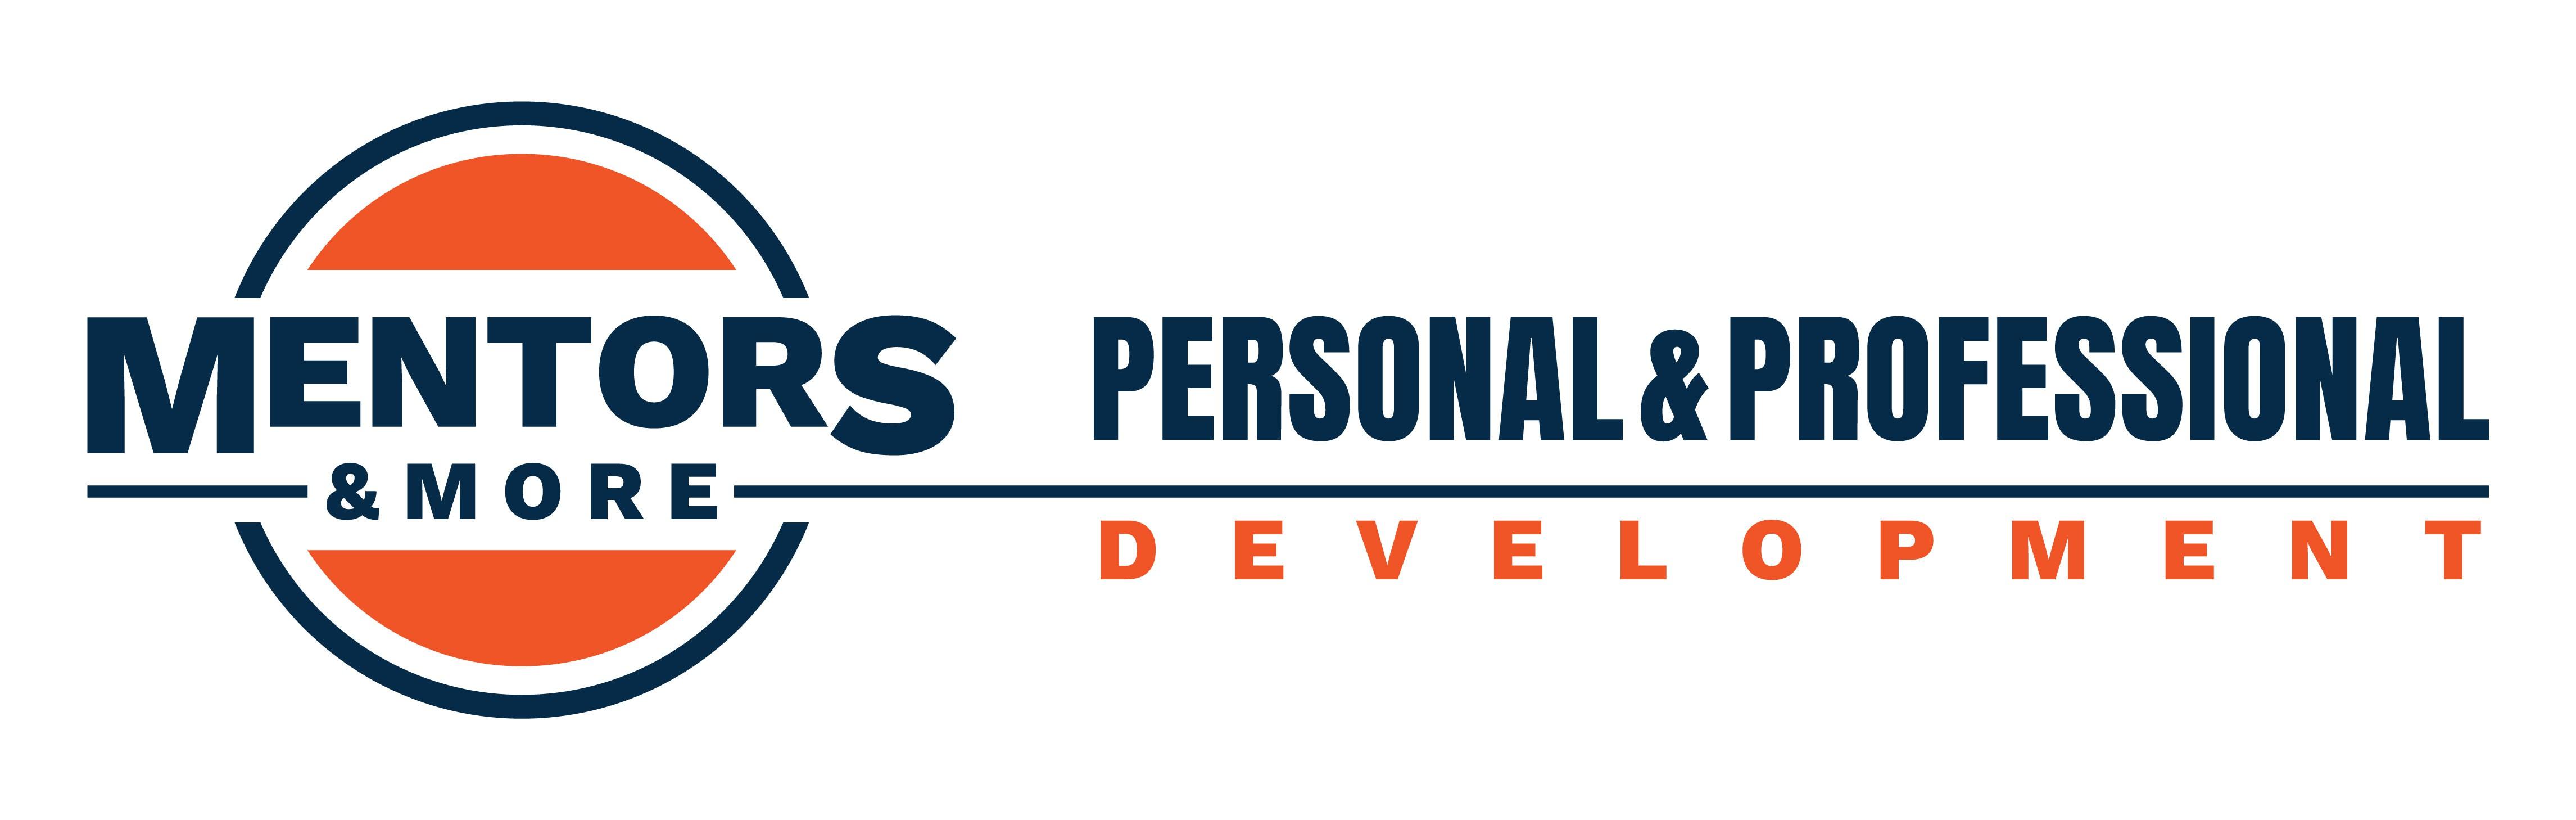 Logo design for personal development company